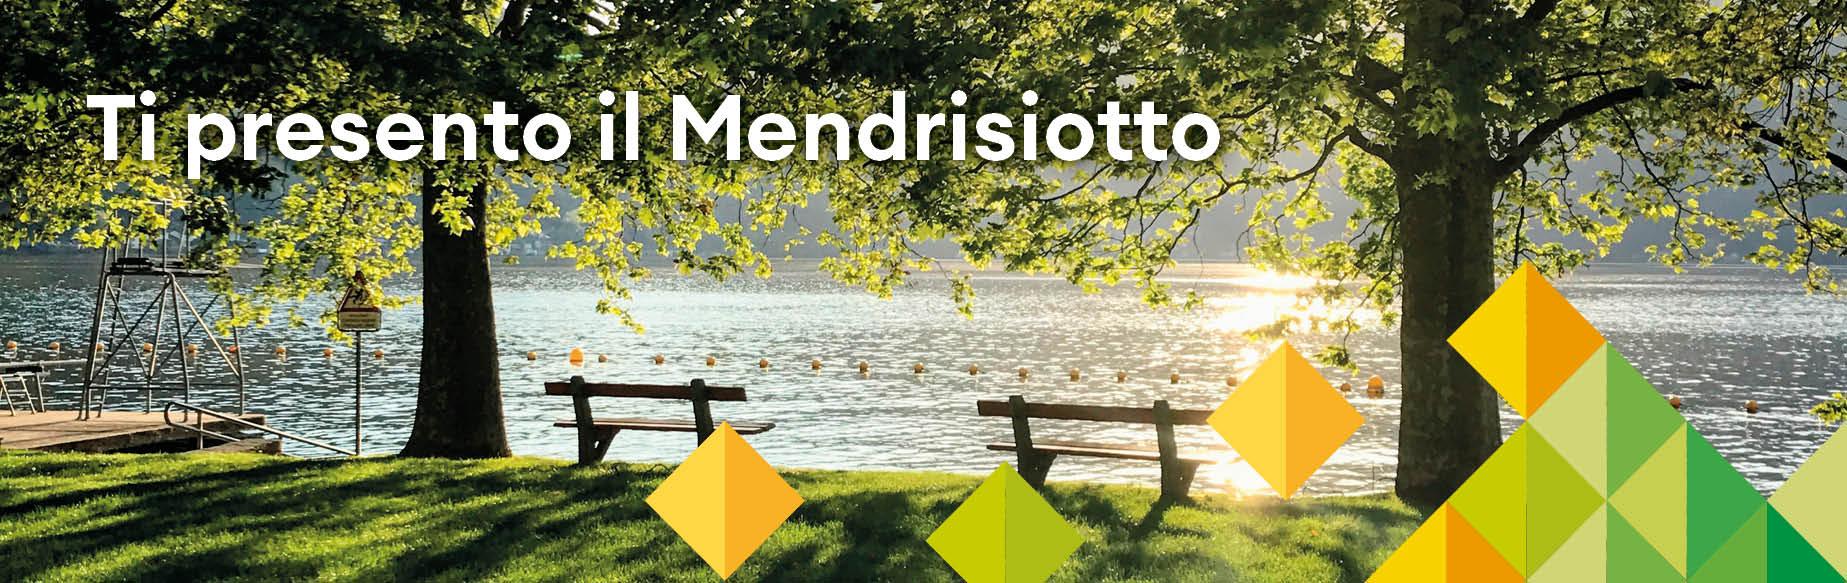 Banner orizzontale Mendrisiotto